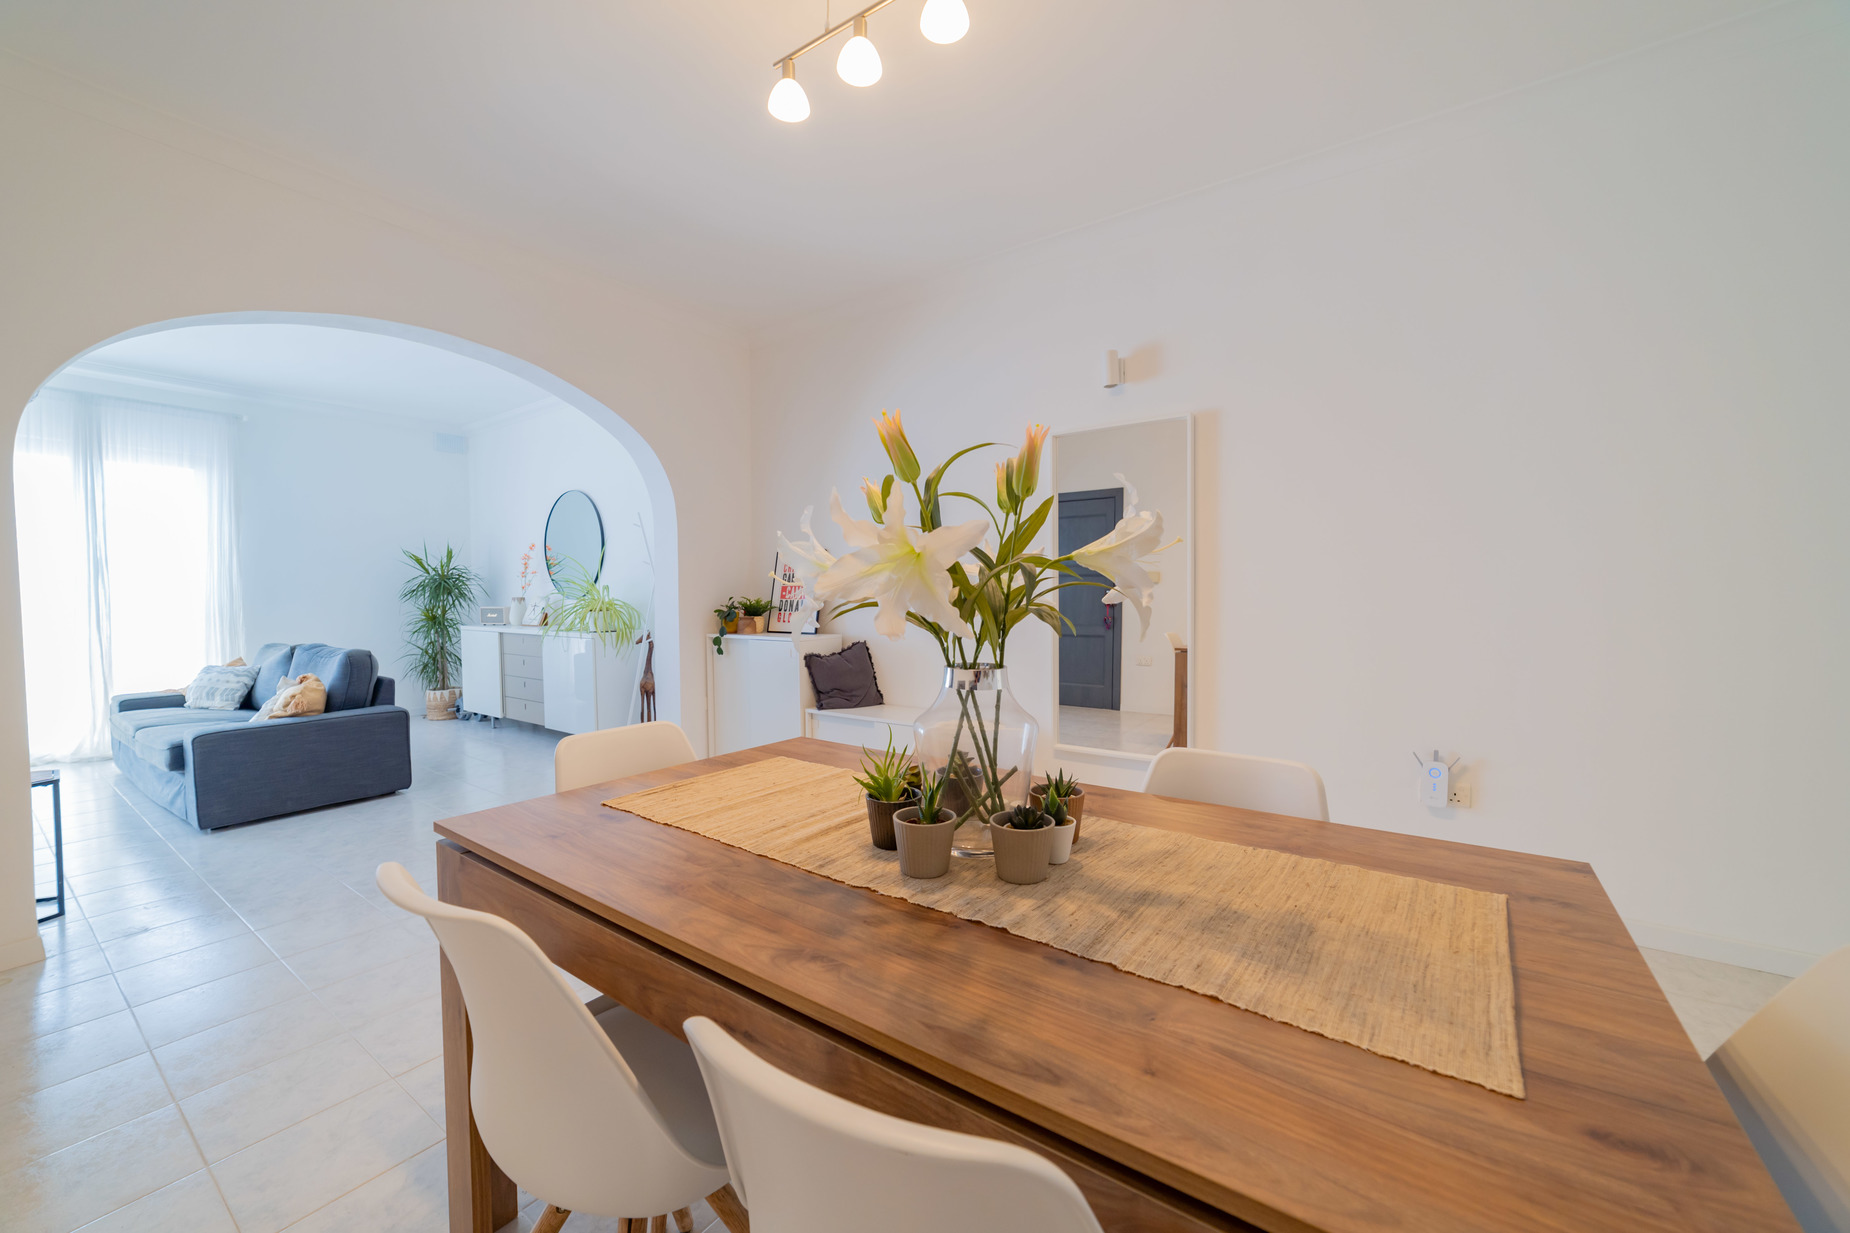 3 bed Apartment For Sale in Naxxar, Naxxar - thumb 6